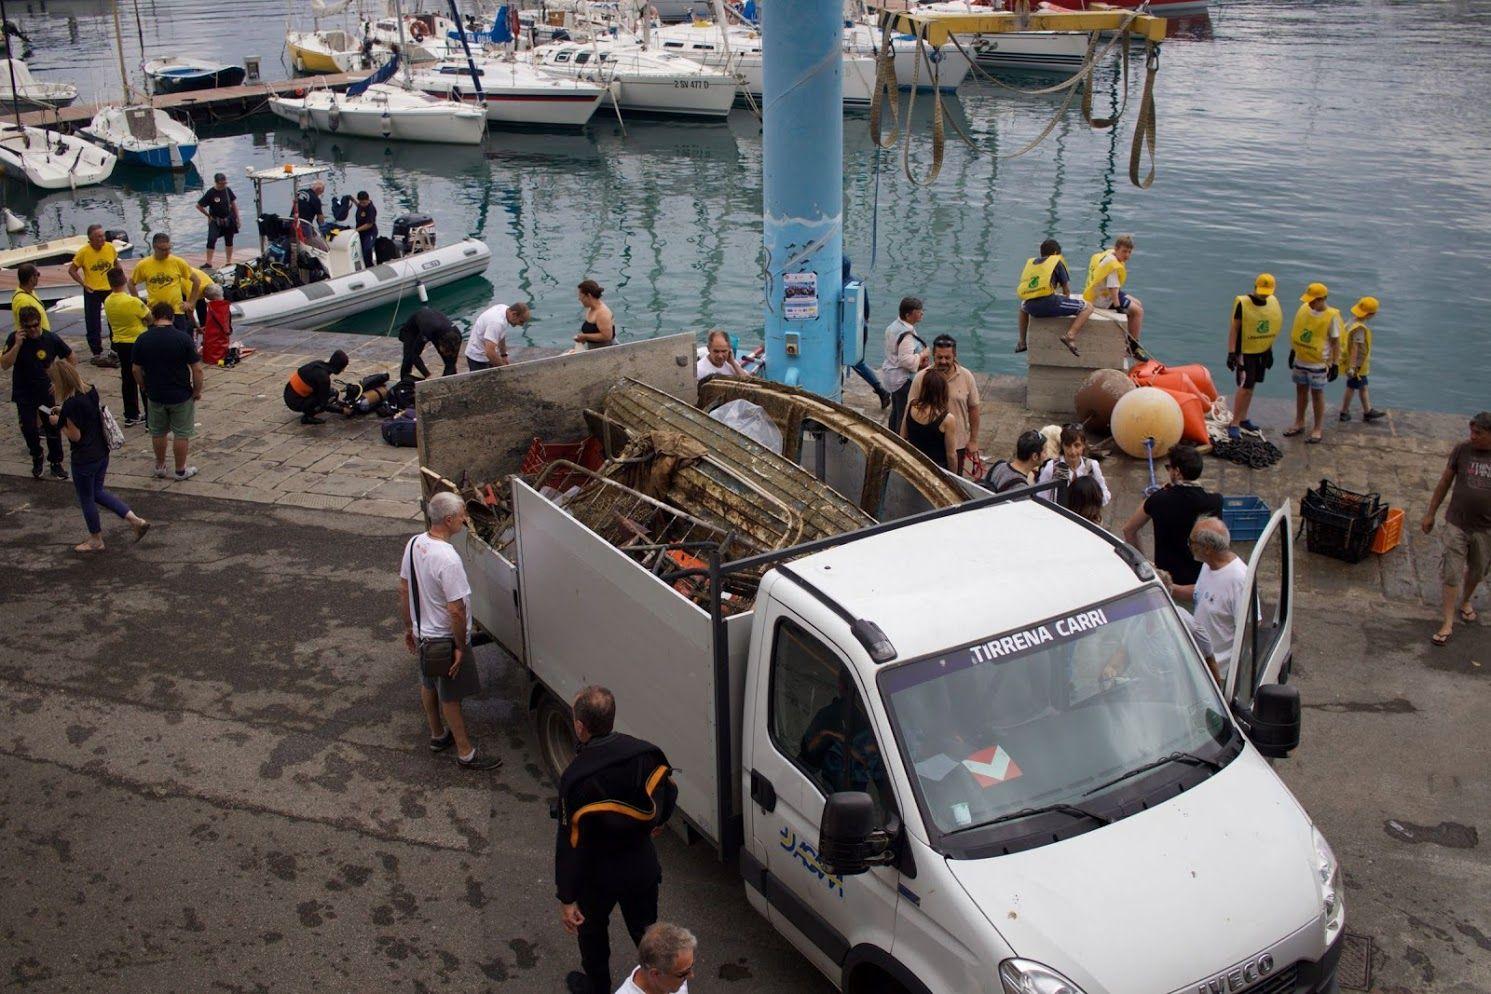 Lega navale Lerici Sub Fondali puliti 4 Giugno 17 - 78.jpg